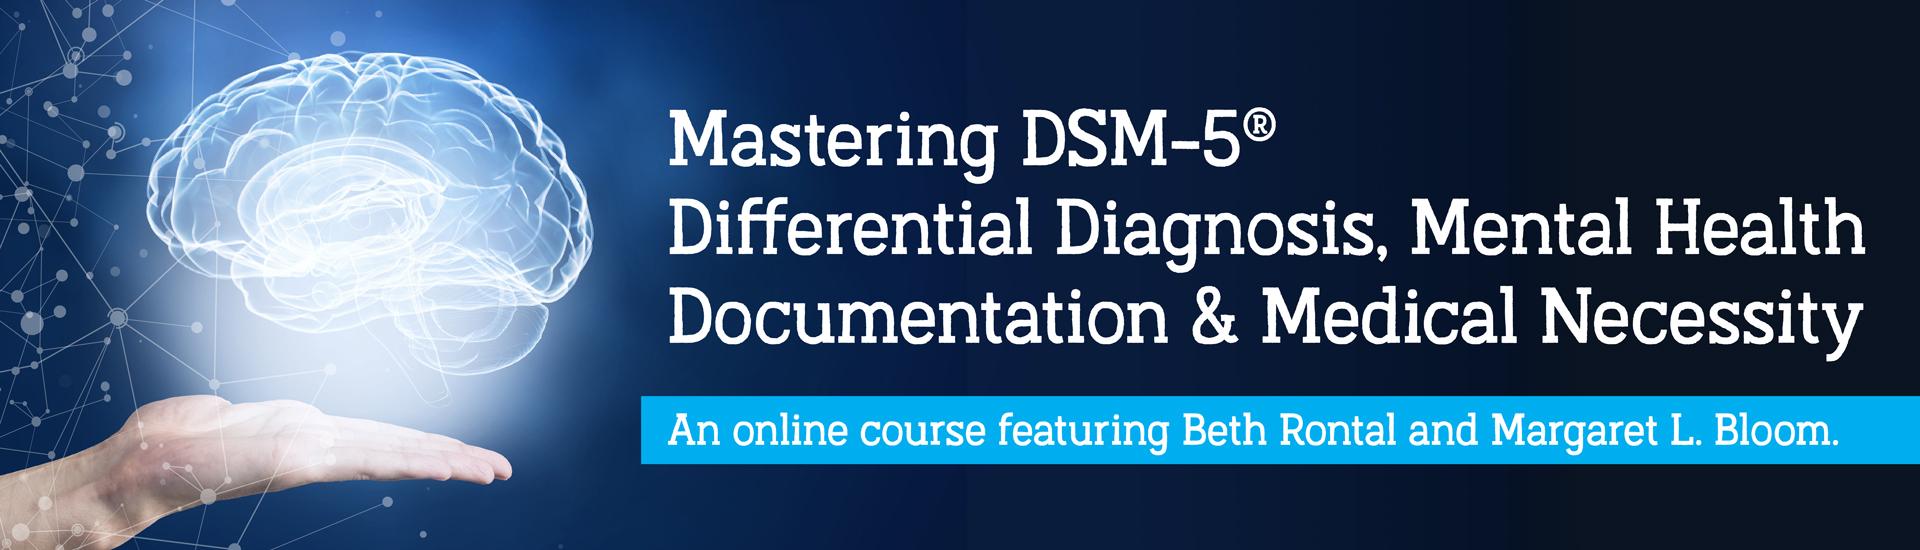 Mastering DSM-5®, Mental Health Documentation & Medical Necessity